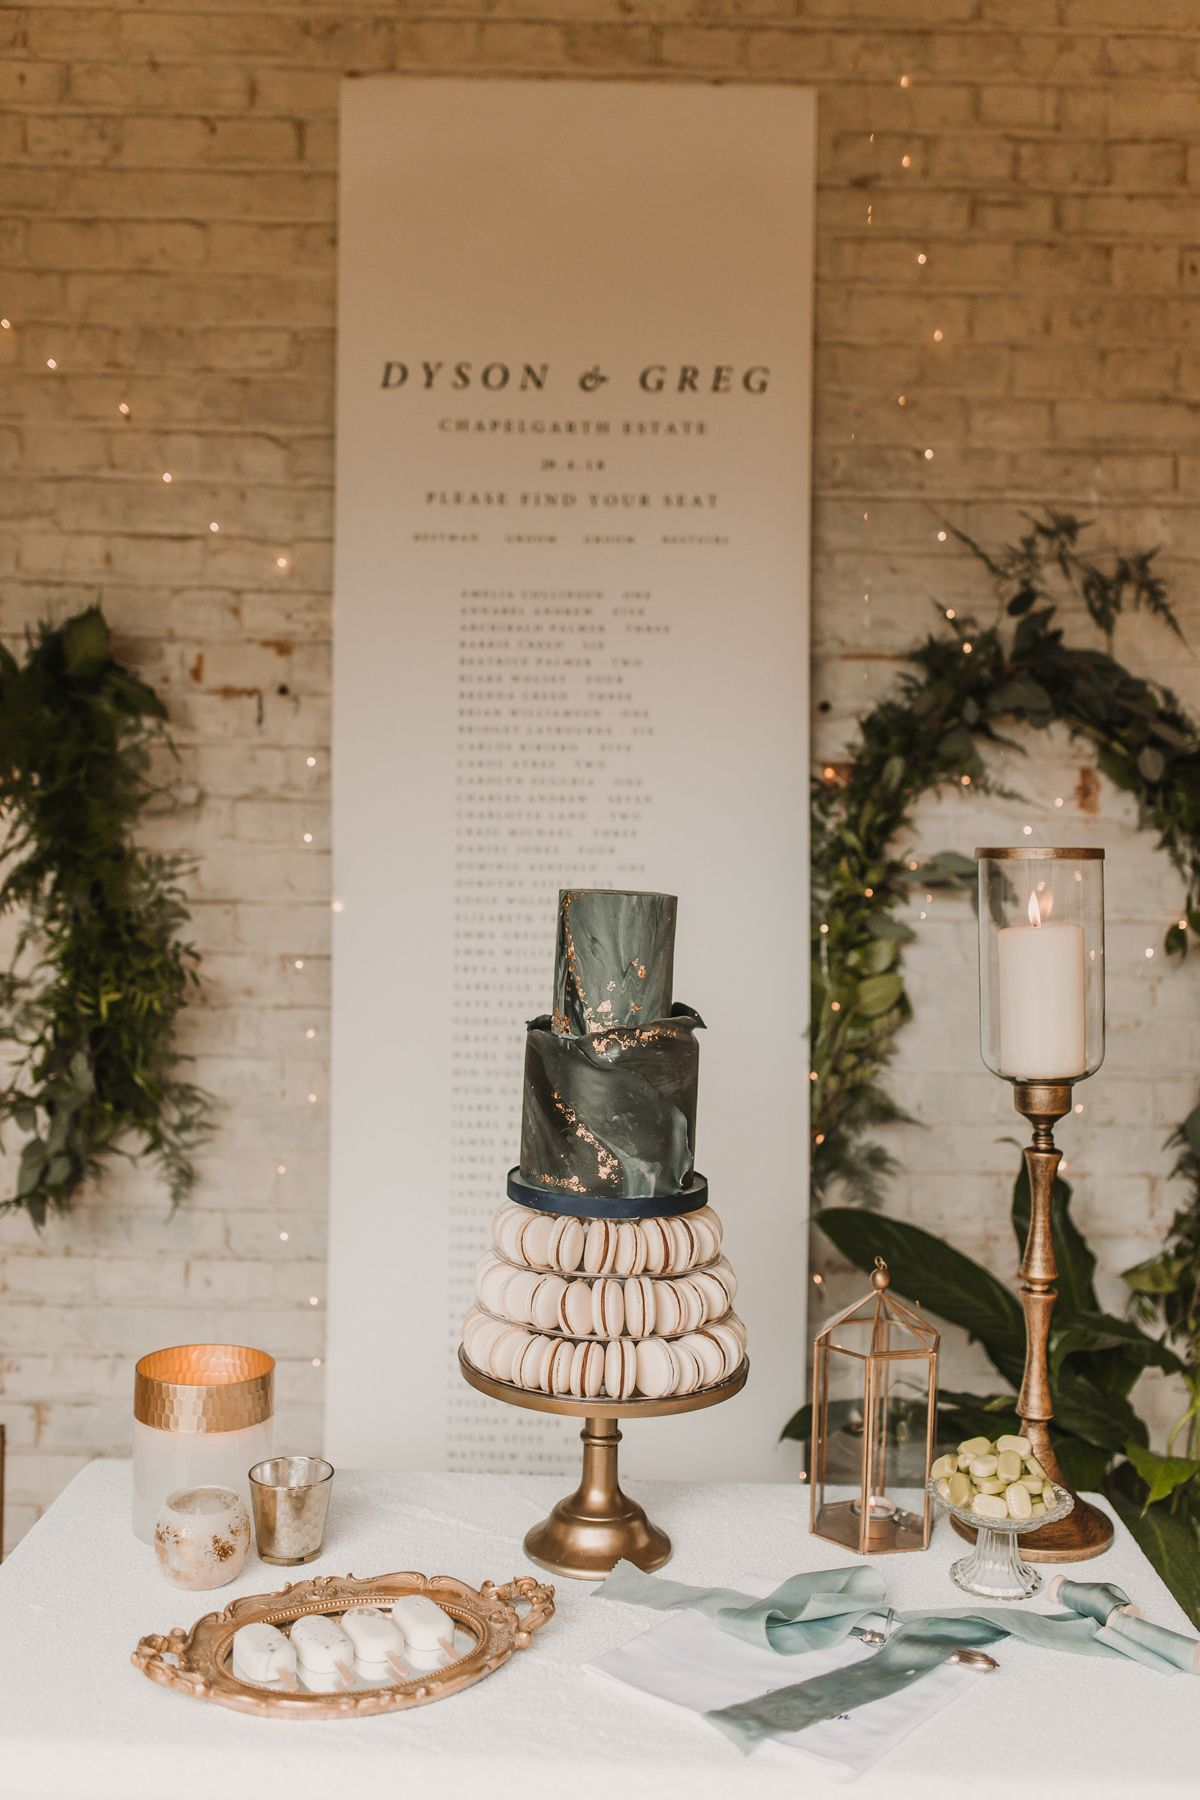 Two grooms wedding cake